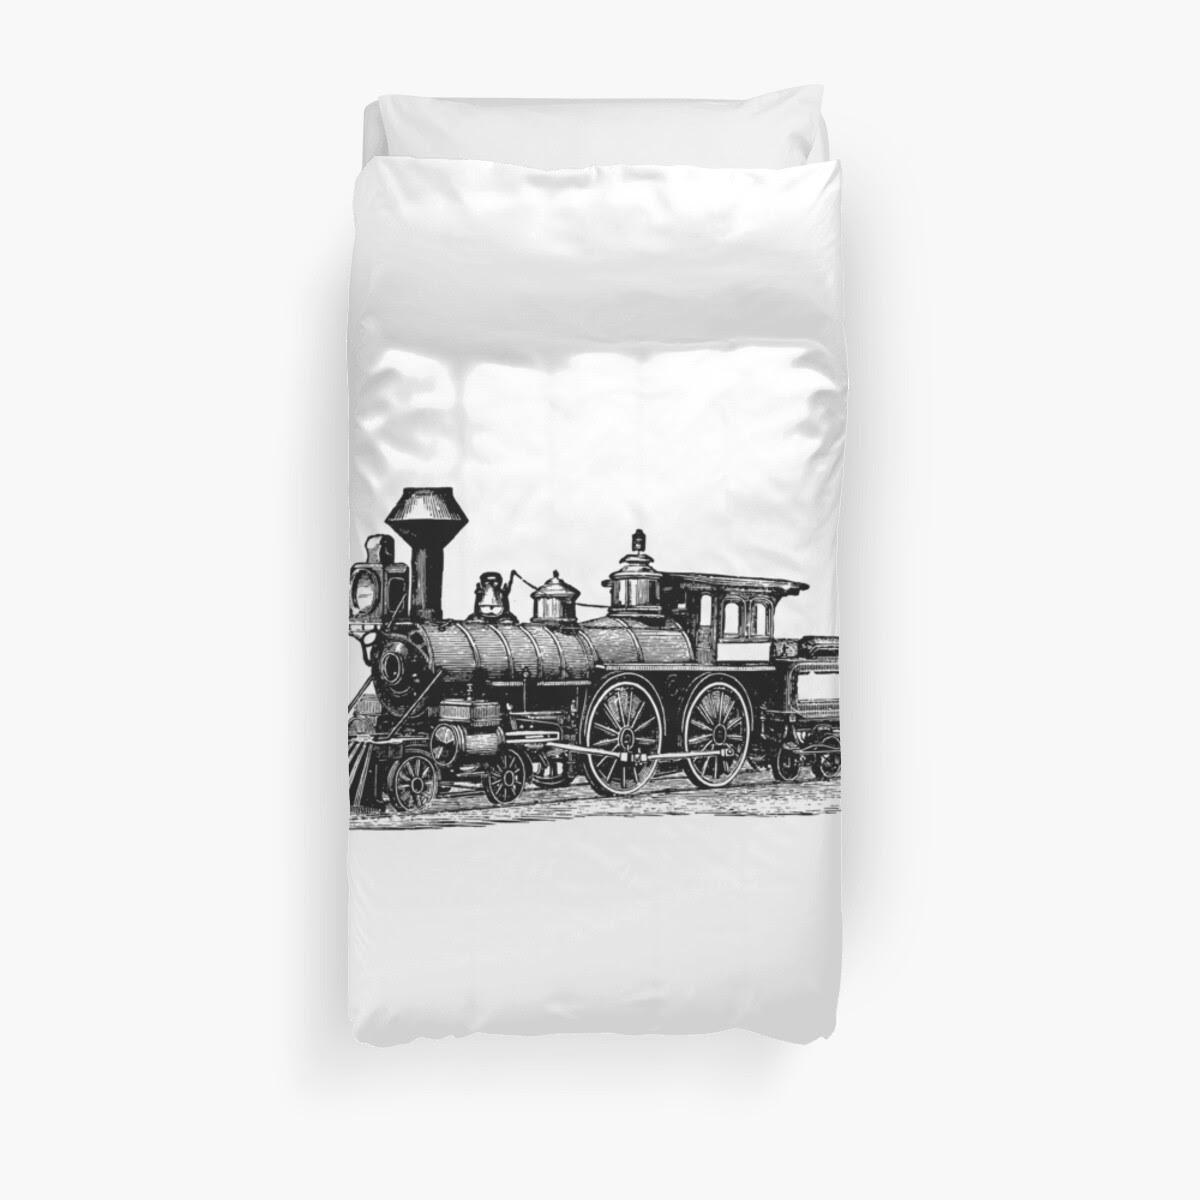 Vintage Locomotive 0713